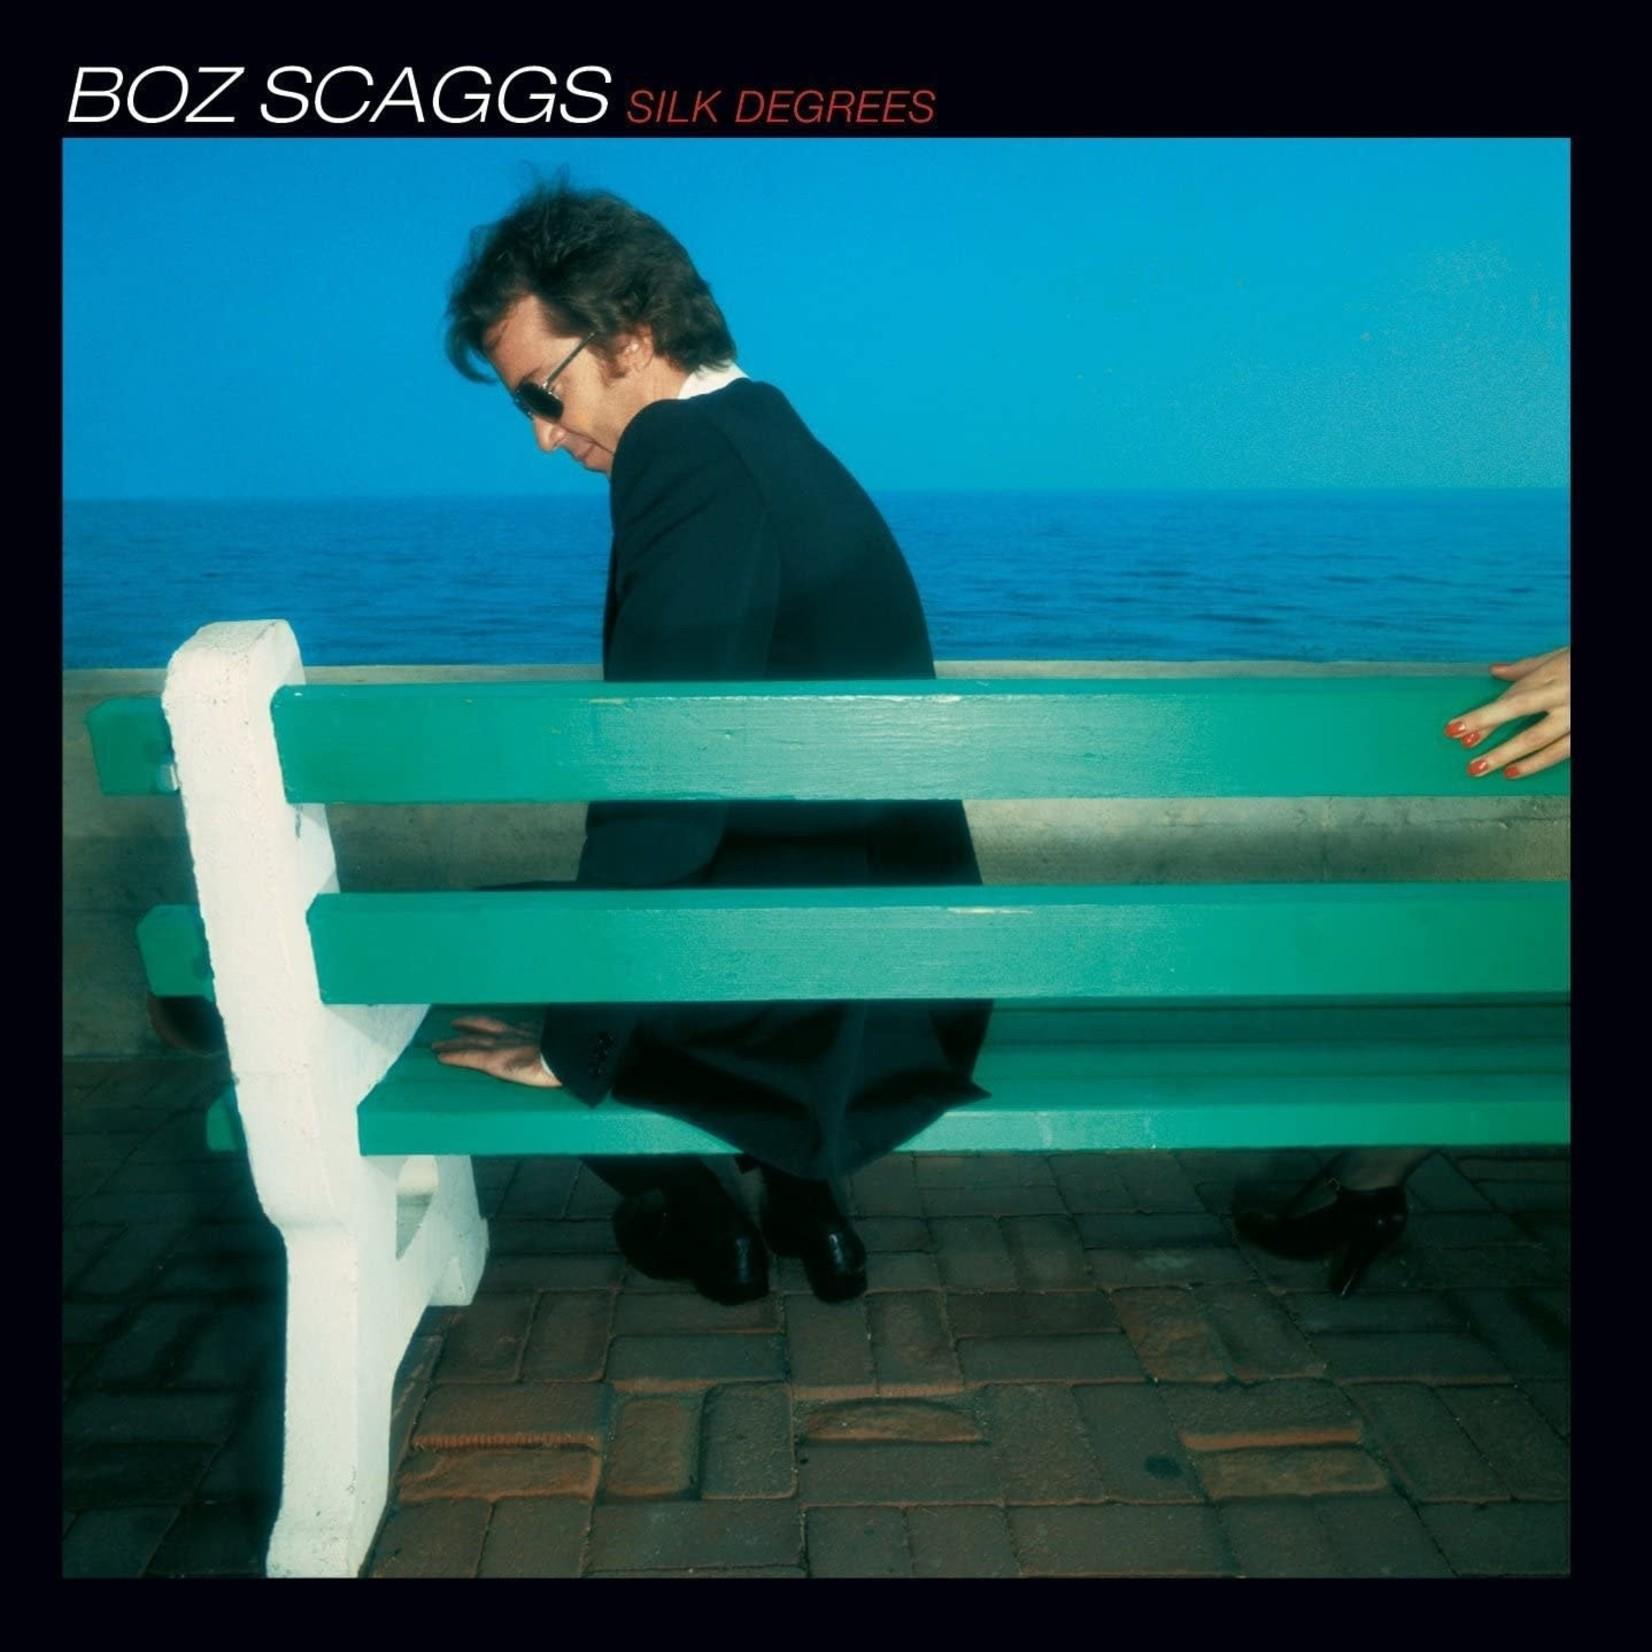 [Vintage] Scaggs, Boz: Silk Degrees